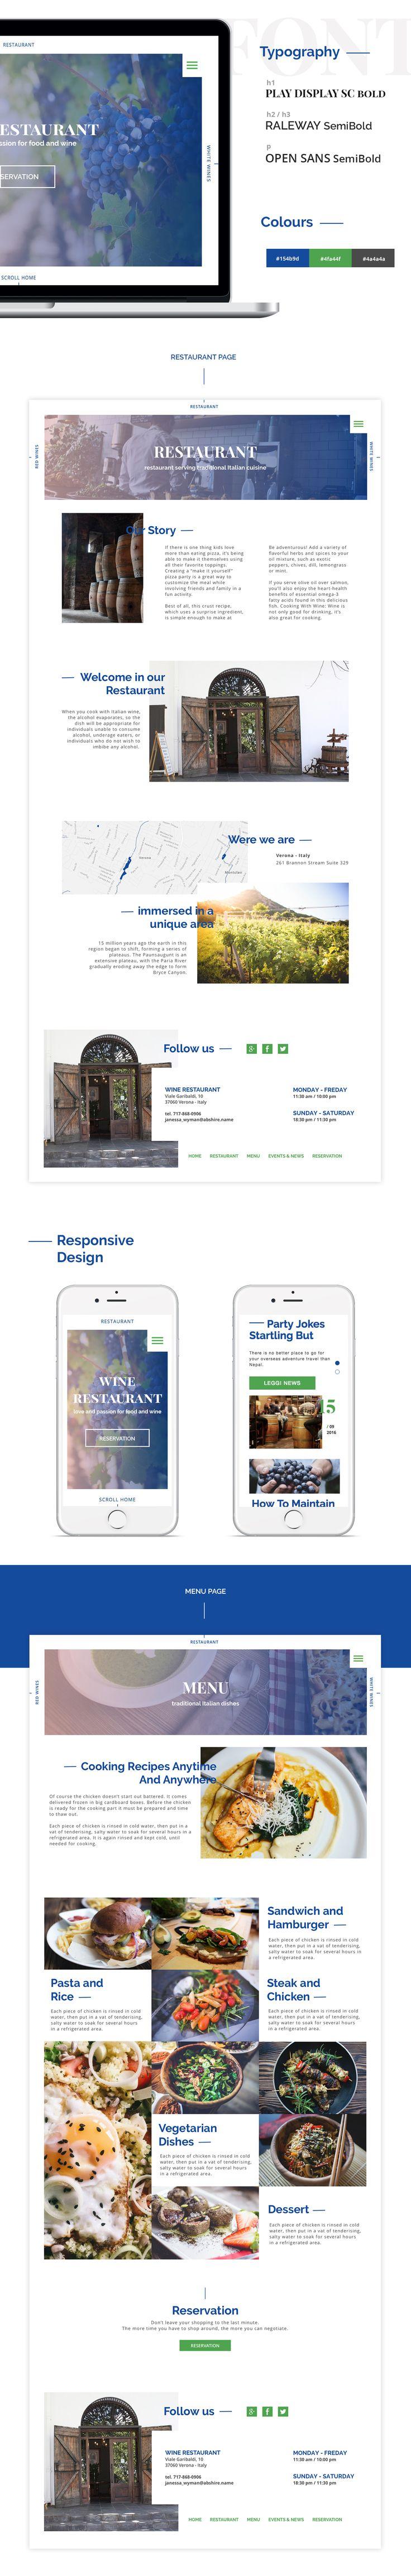 #webdesign concept for a #restaurant